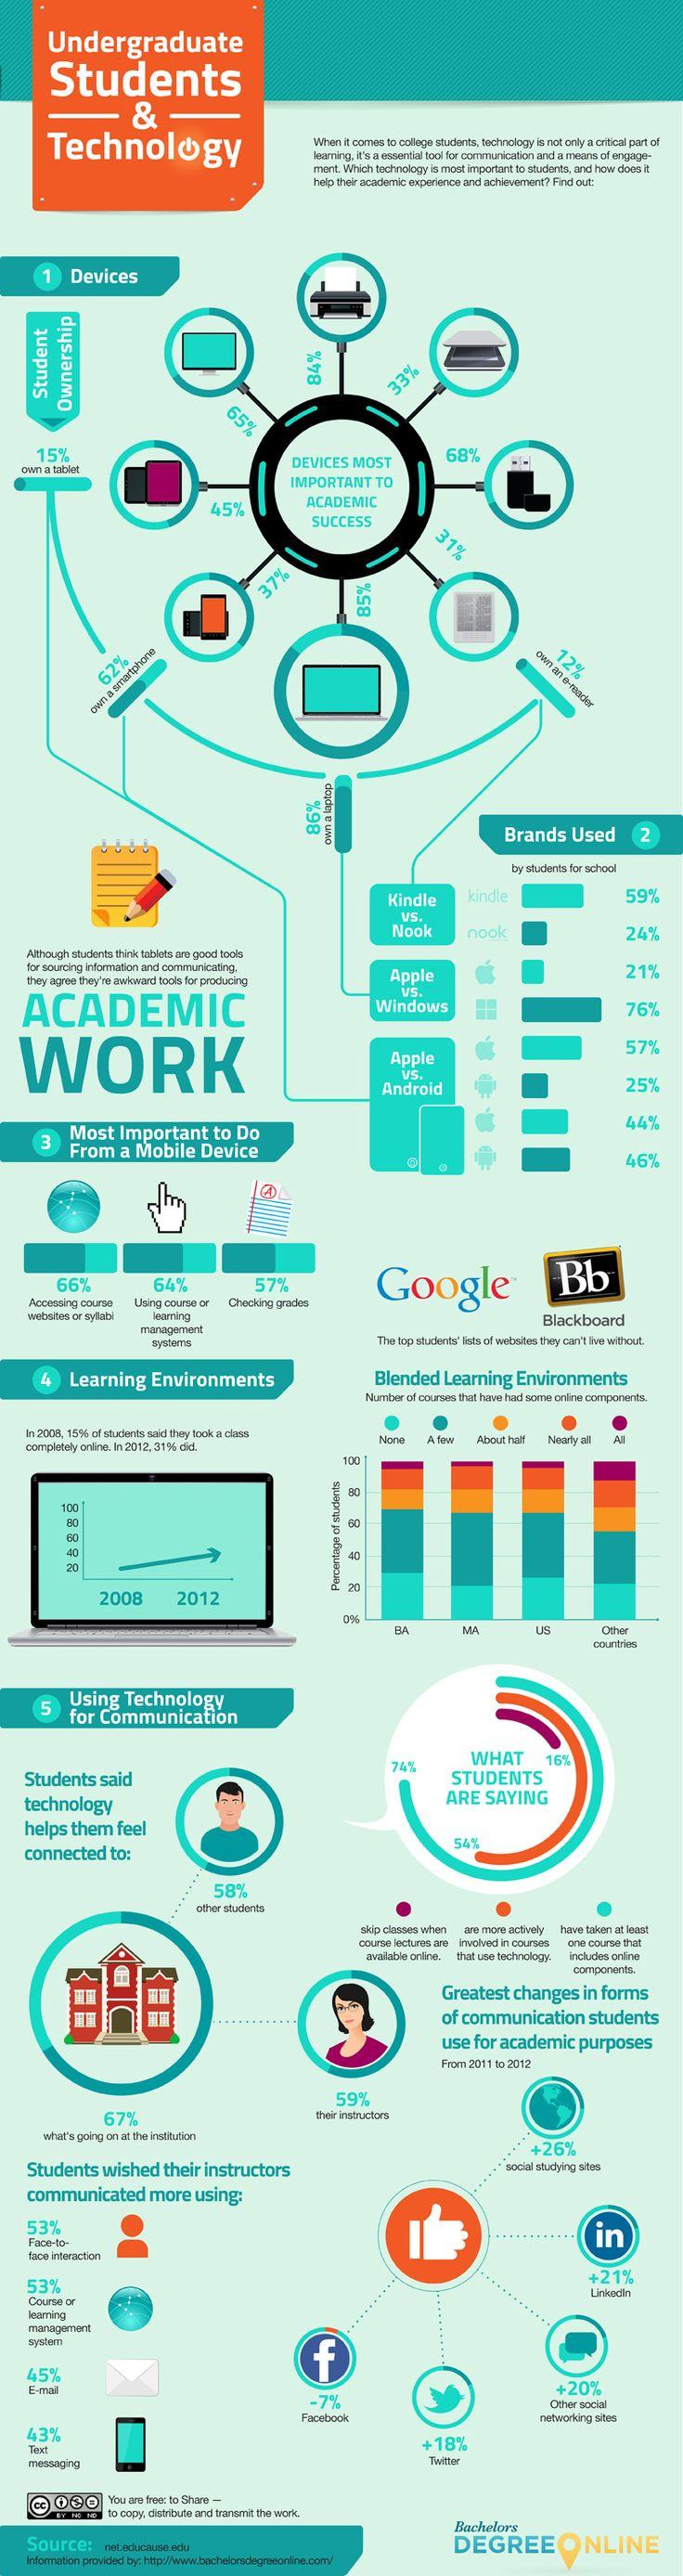 Undergraduate Students & Technology